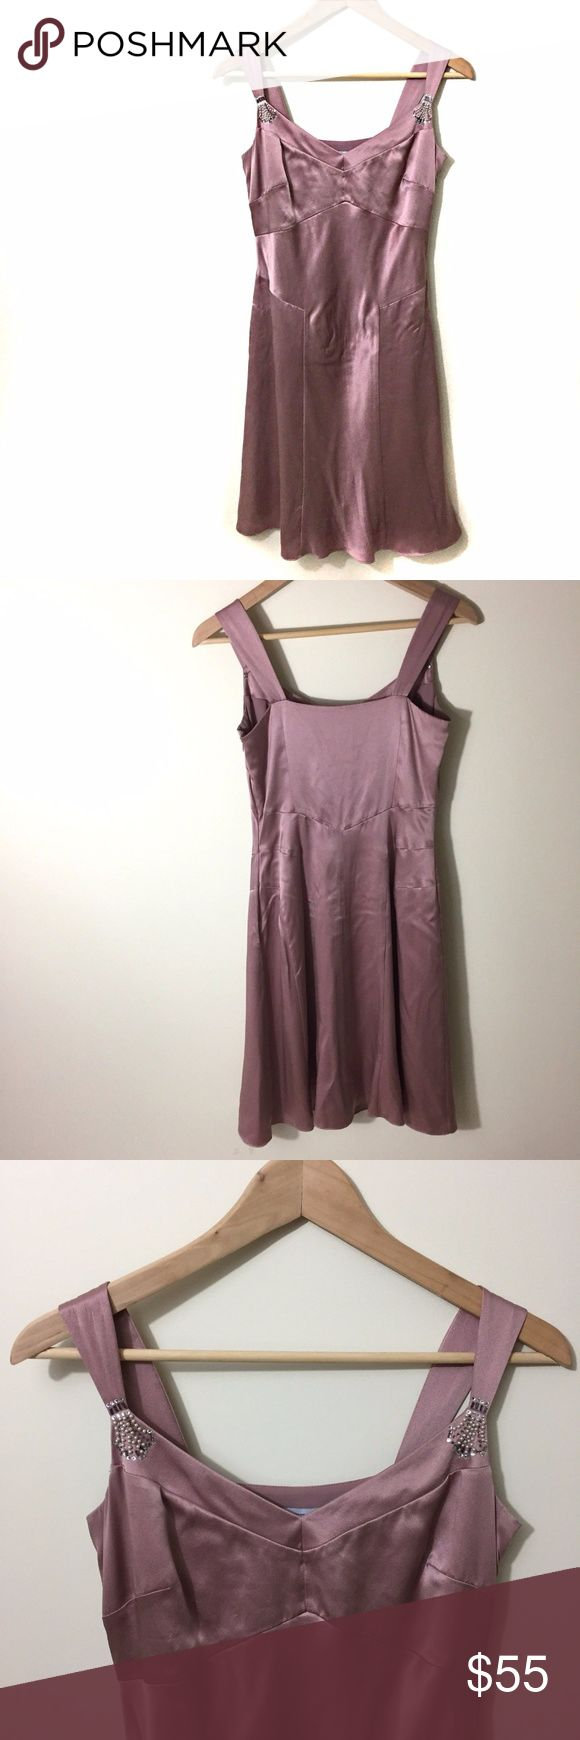 "LOFT Blush Rose Pink Silk Dress Size 2 LOFT dress with a satin finish, size 2.  Underarm to underarm 17"".  Waist 18.5"".  Length 37"".  100% silk with a polyester lining. LOFT Dresses"